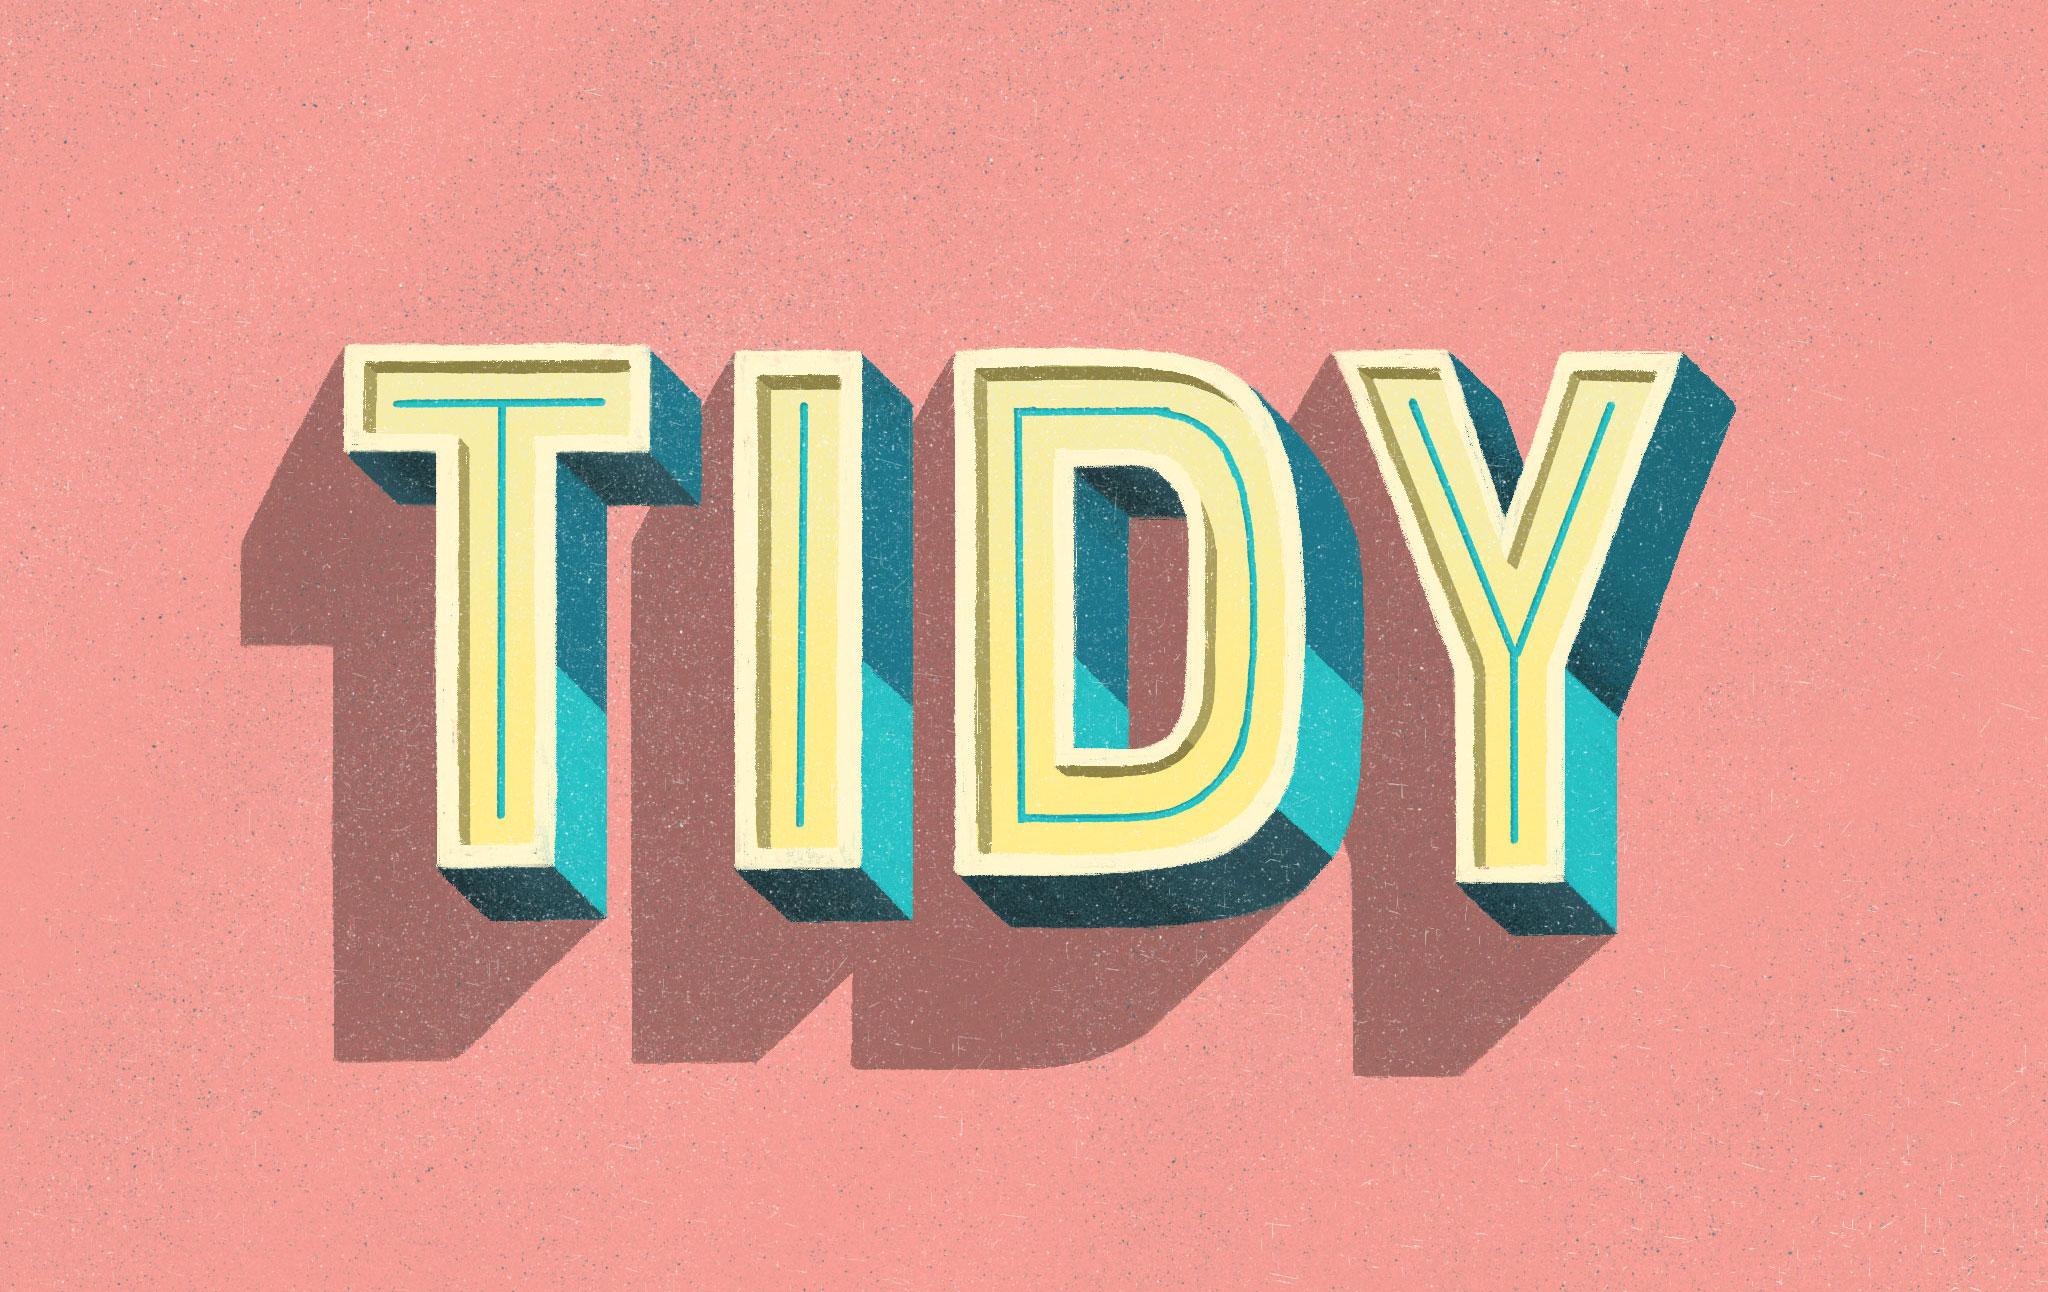 Tidy-Wide